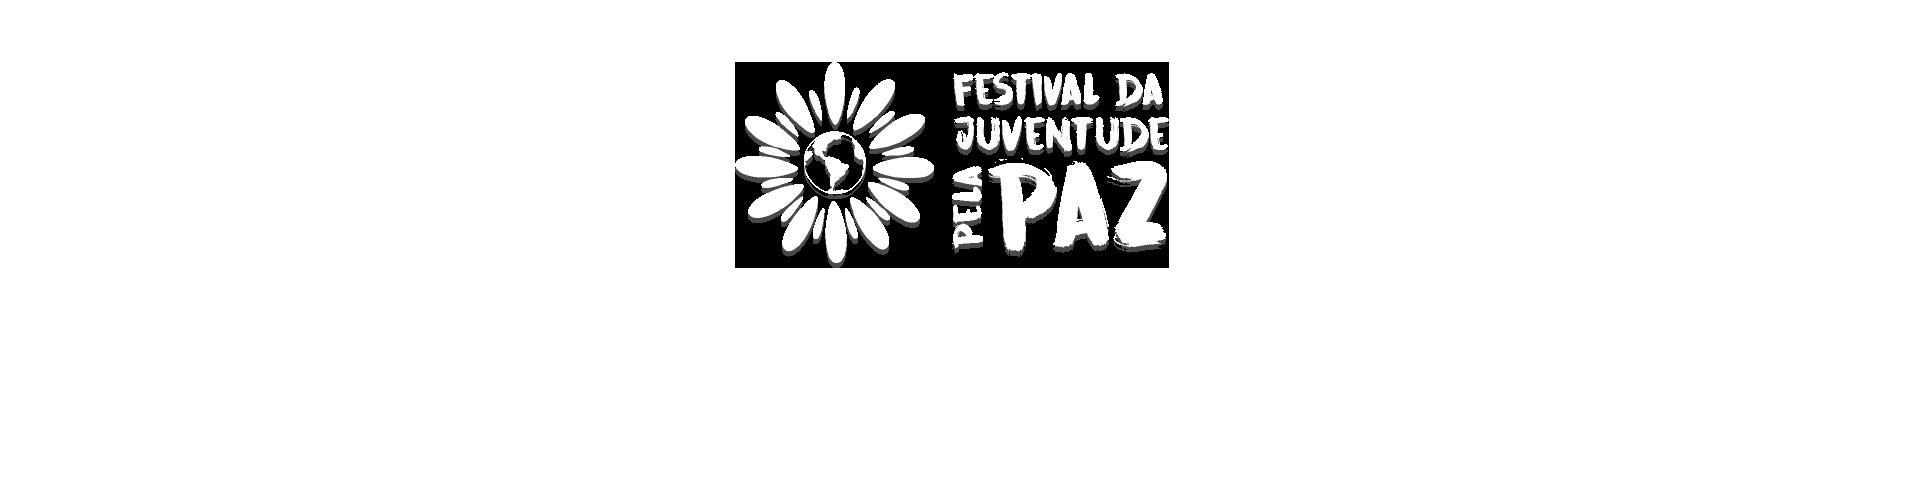 logo-fjpp-pt.png